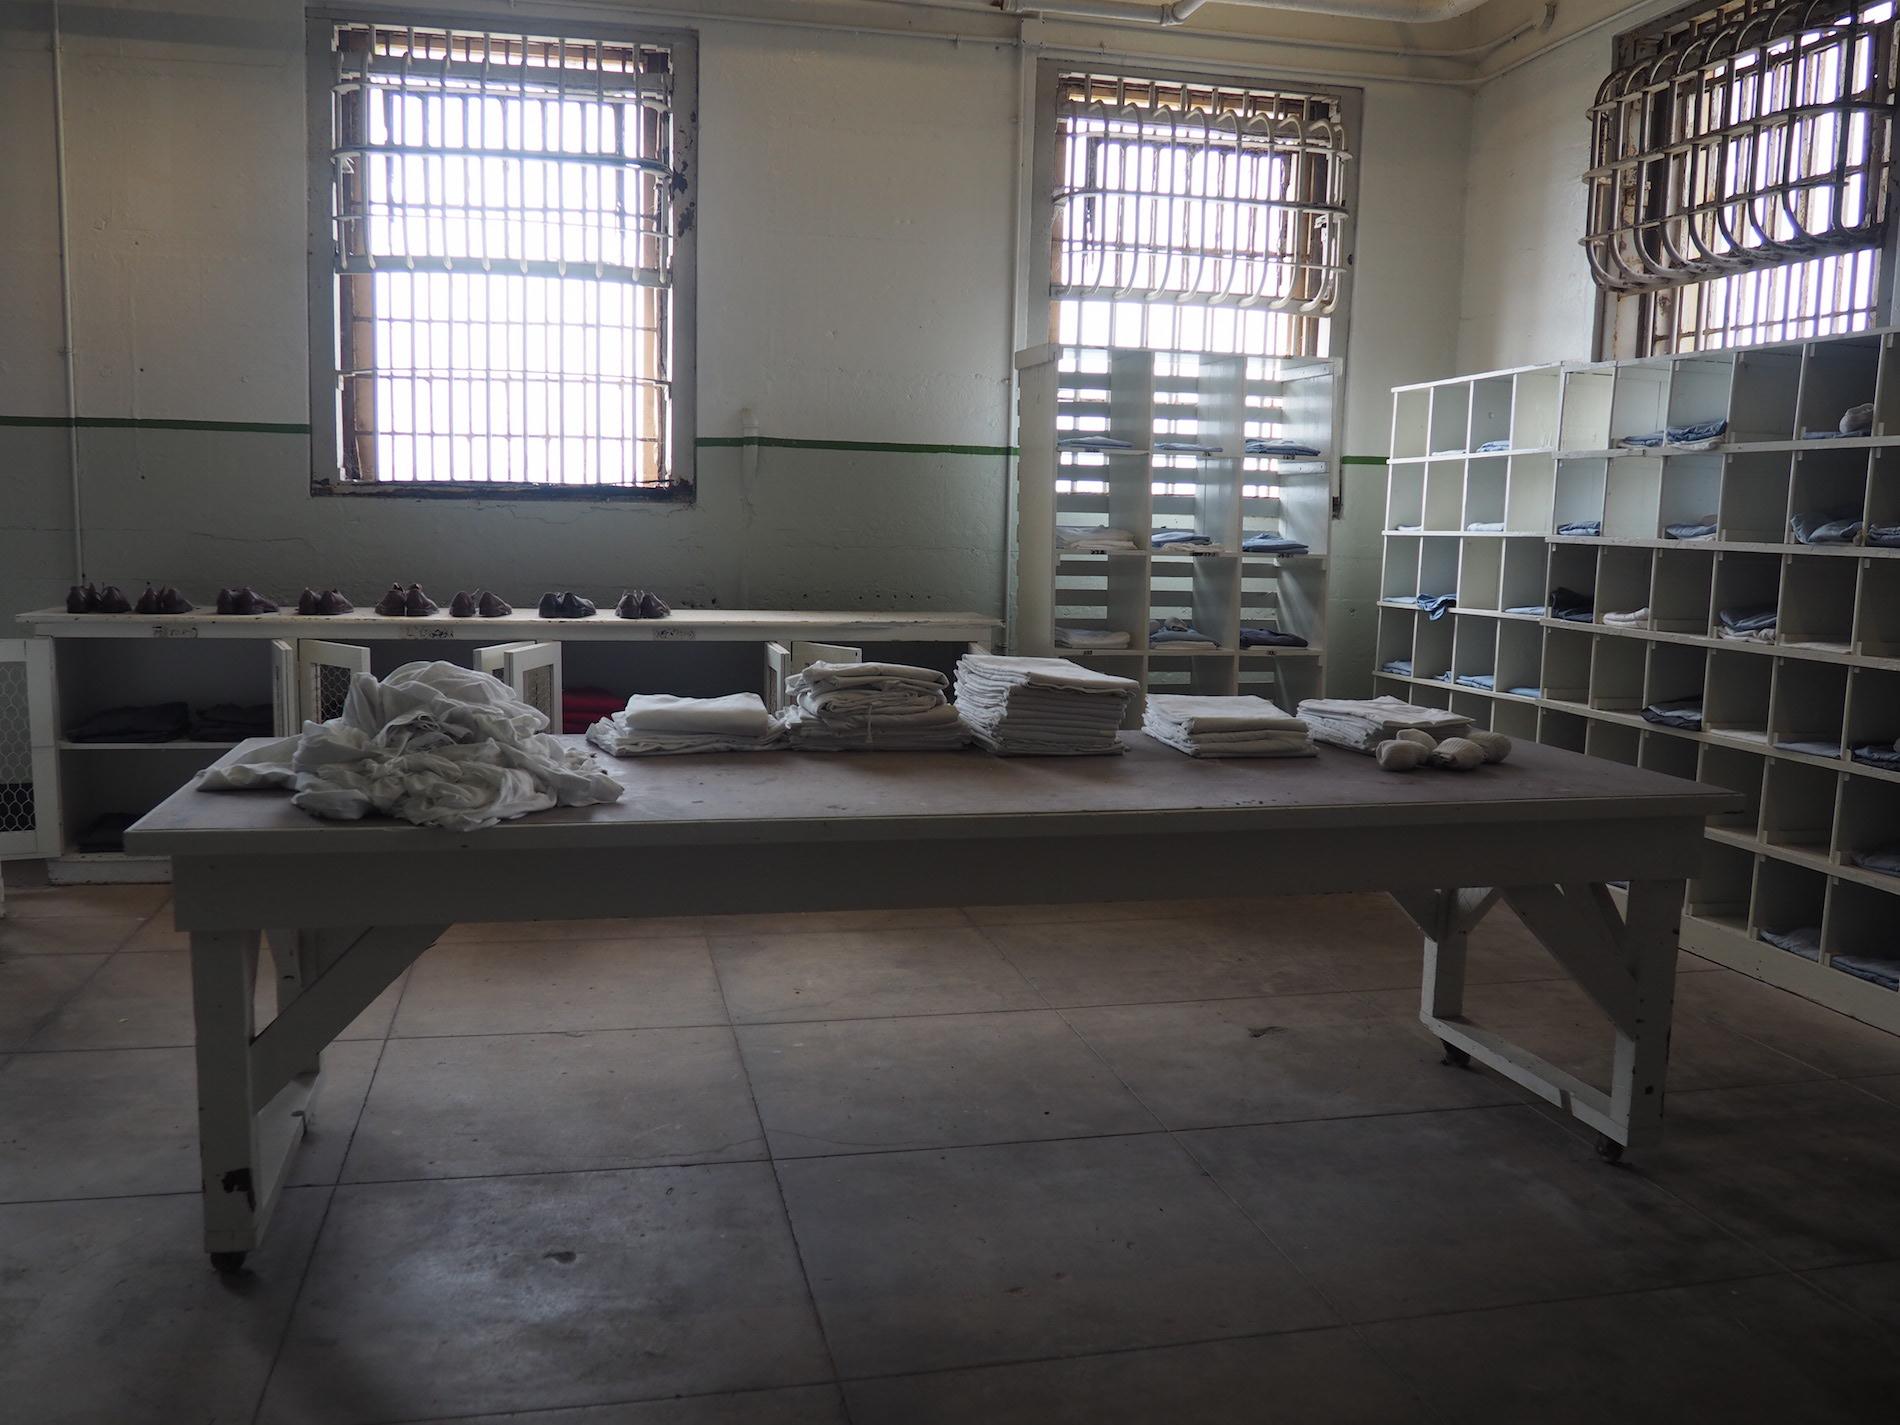 SanFrancisco-Alcatraz